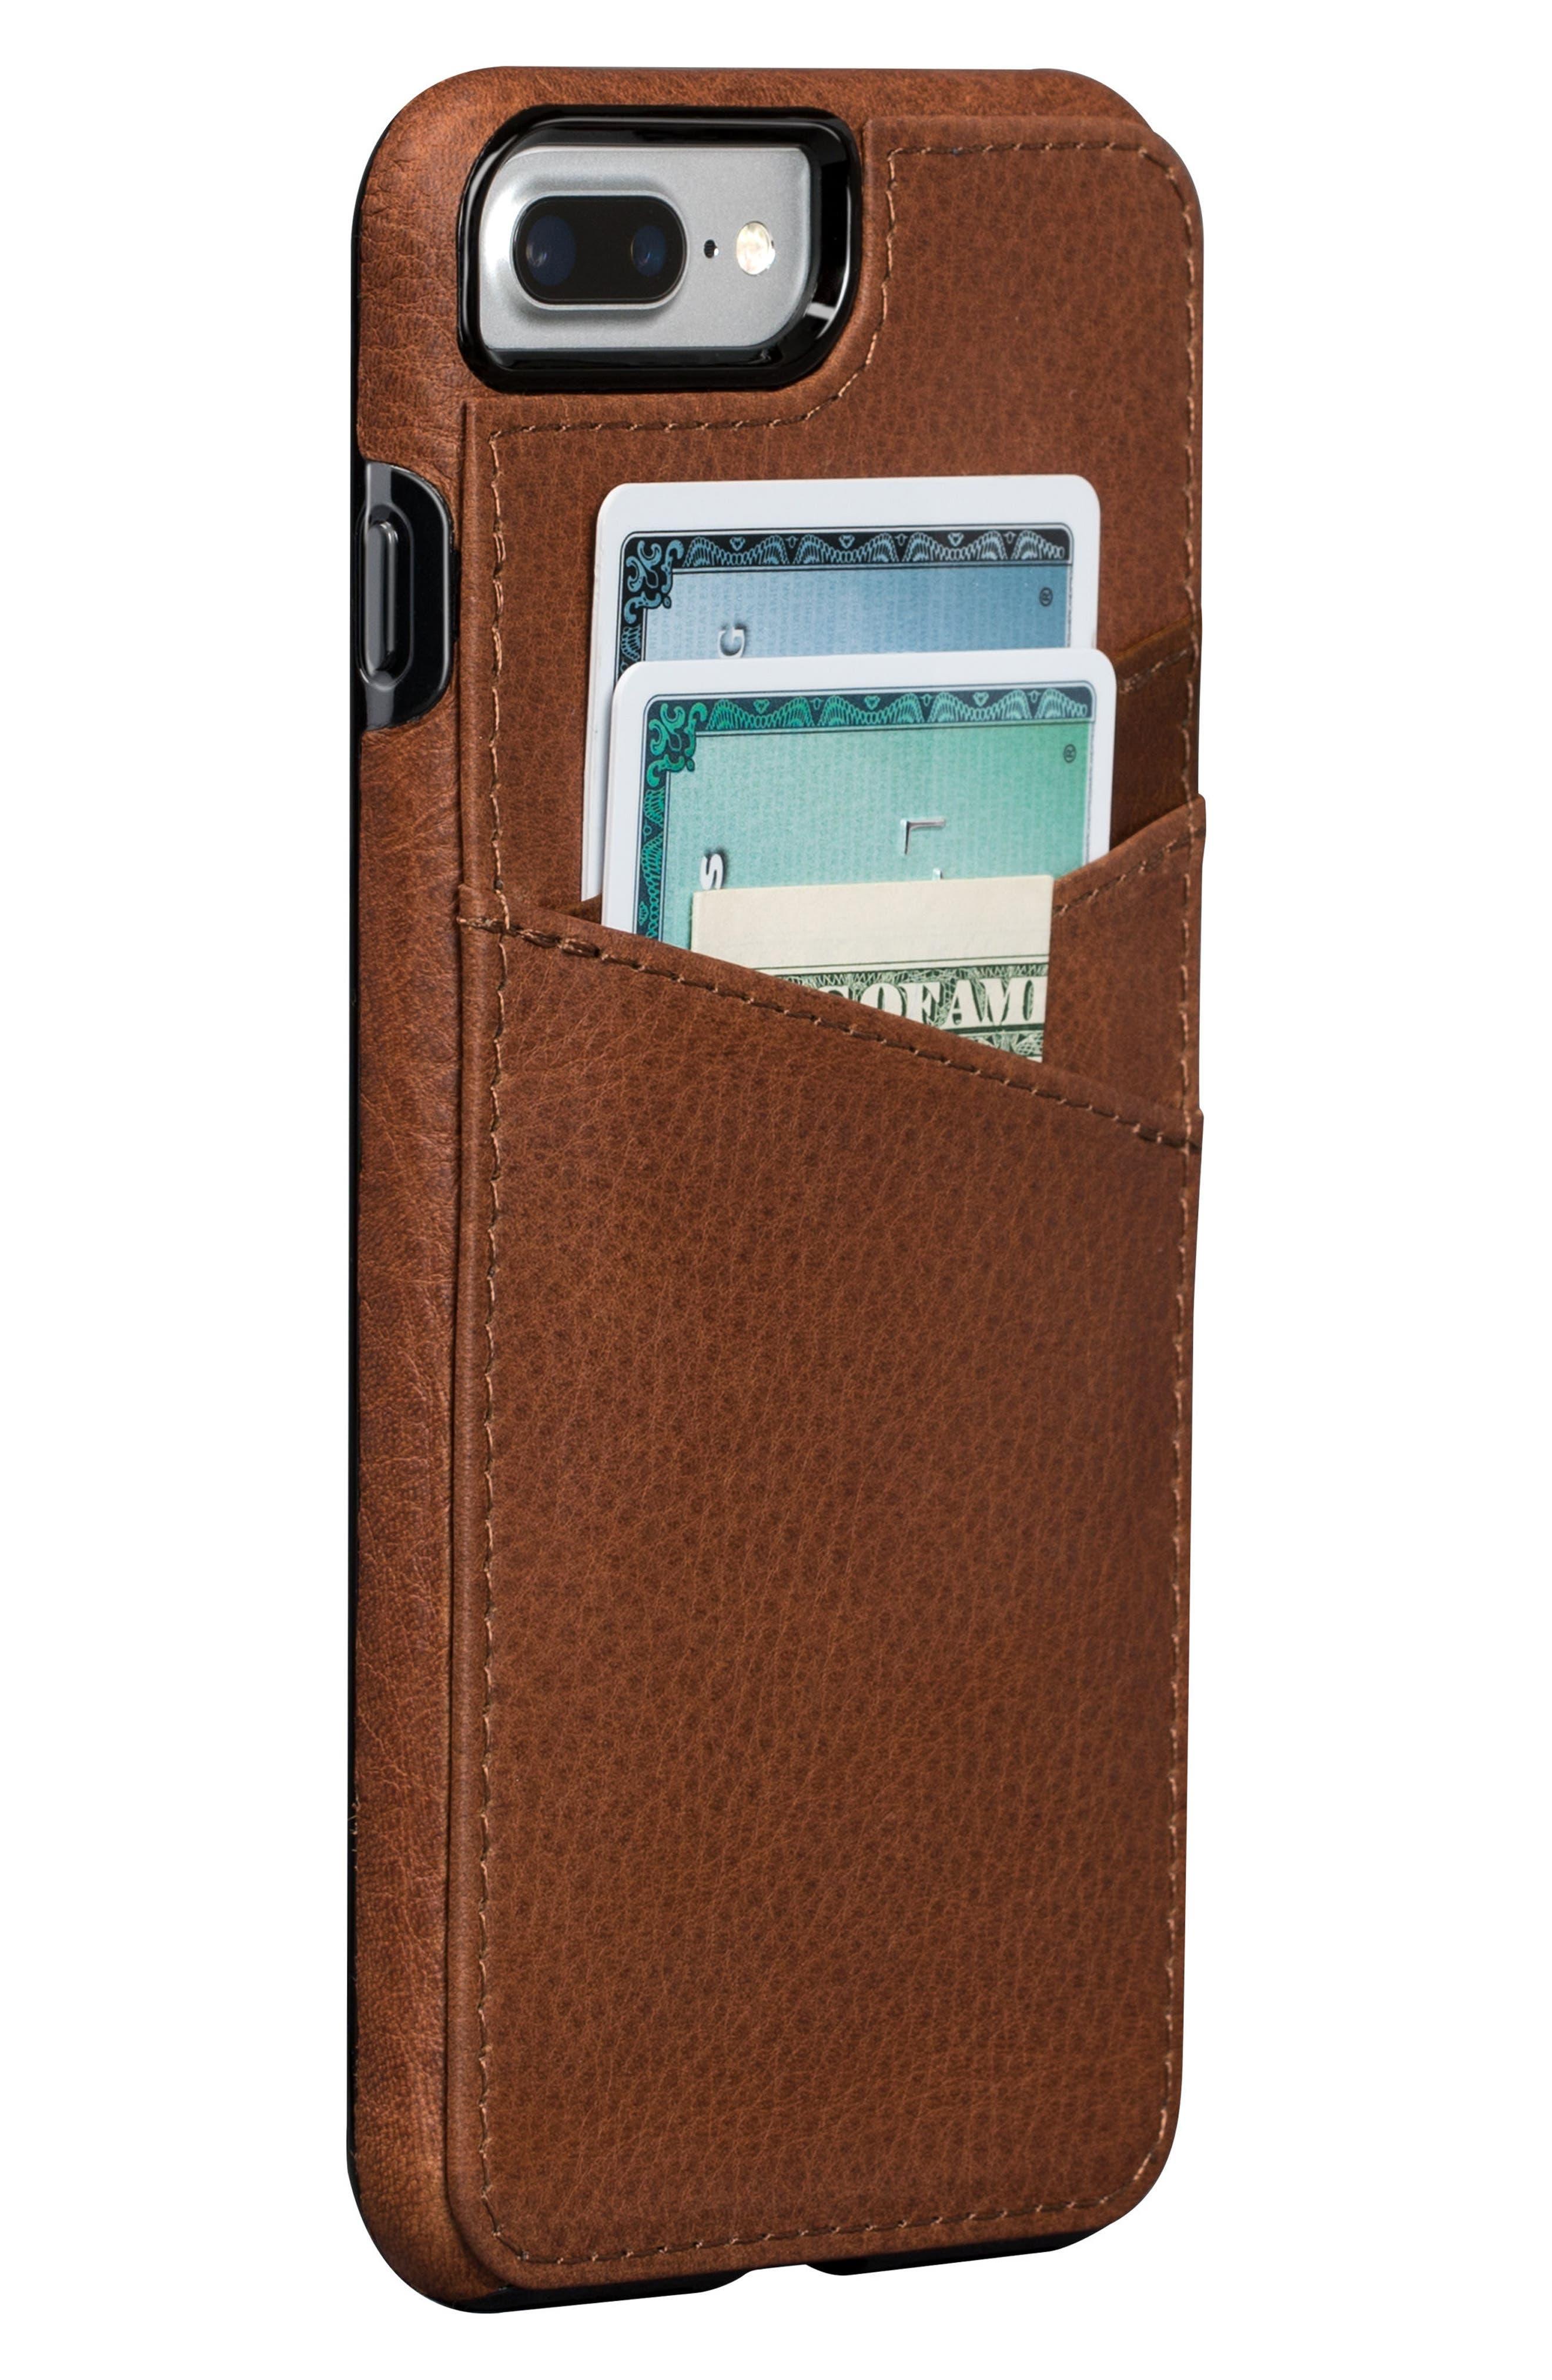 Bence Lugano iPhone 7/8 Plus Wallet Case,                         Main,                         color, SADDLE